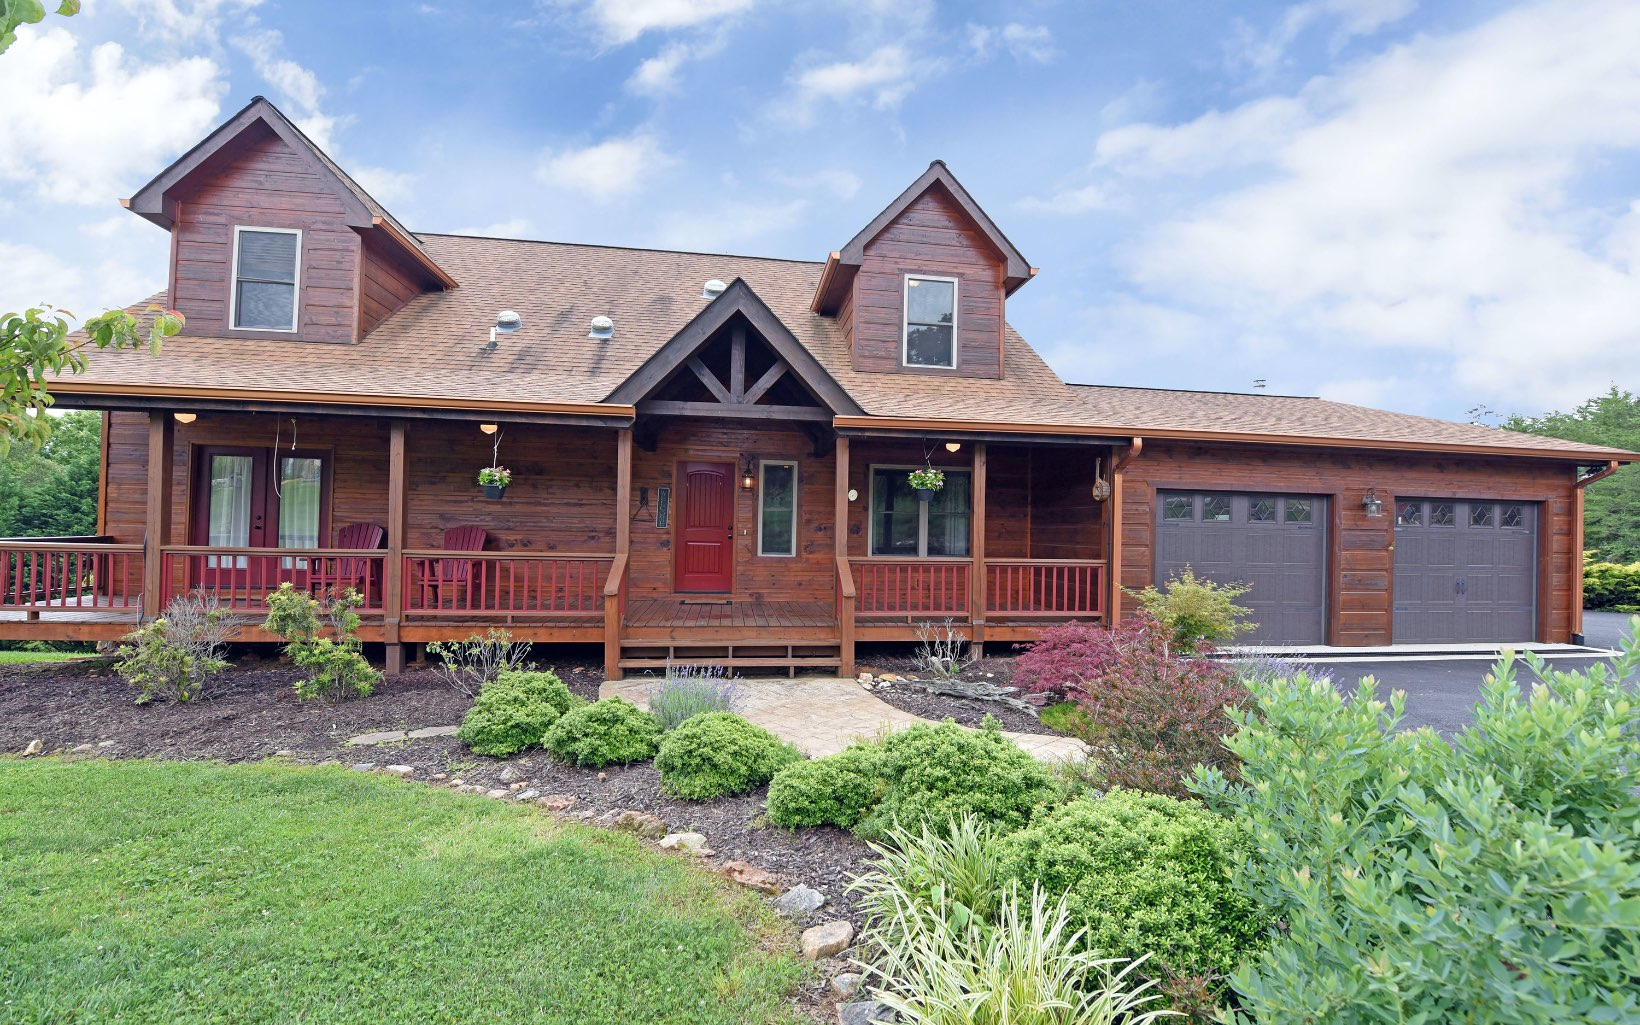 298164 Blairsville Residential